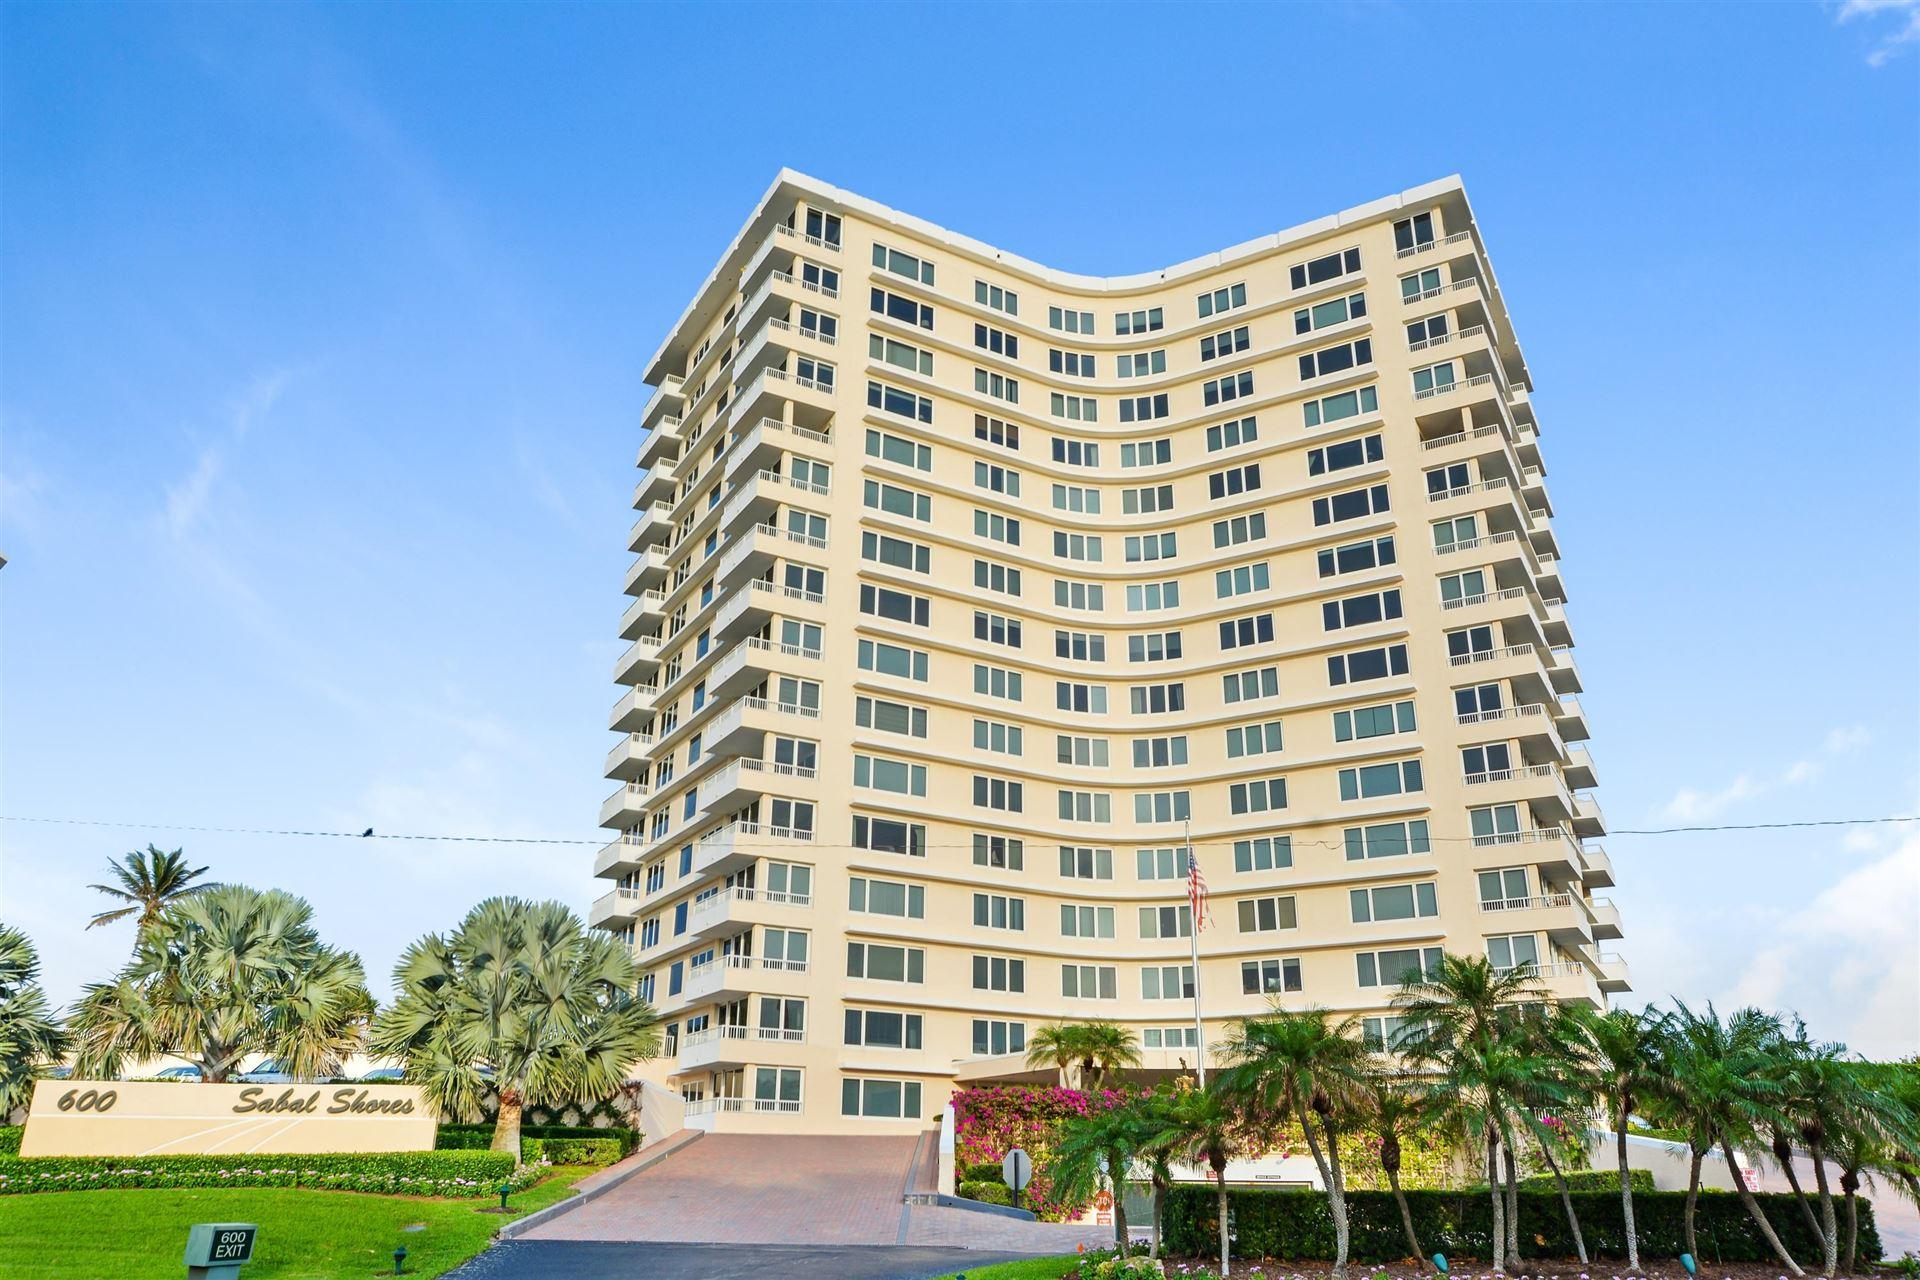 600 S Ocean Boulevard #1602, Boca Raton, FL 33432 - #: RX-10580854